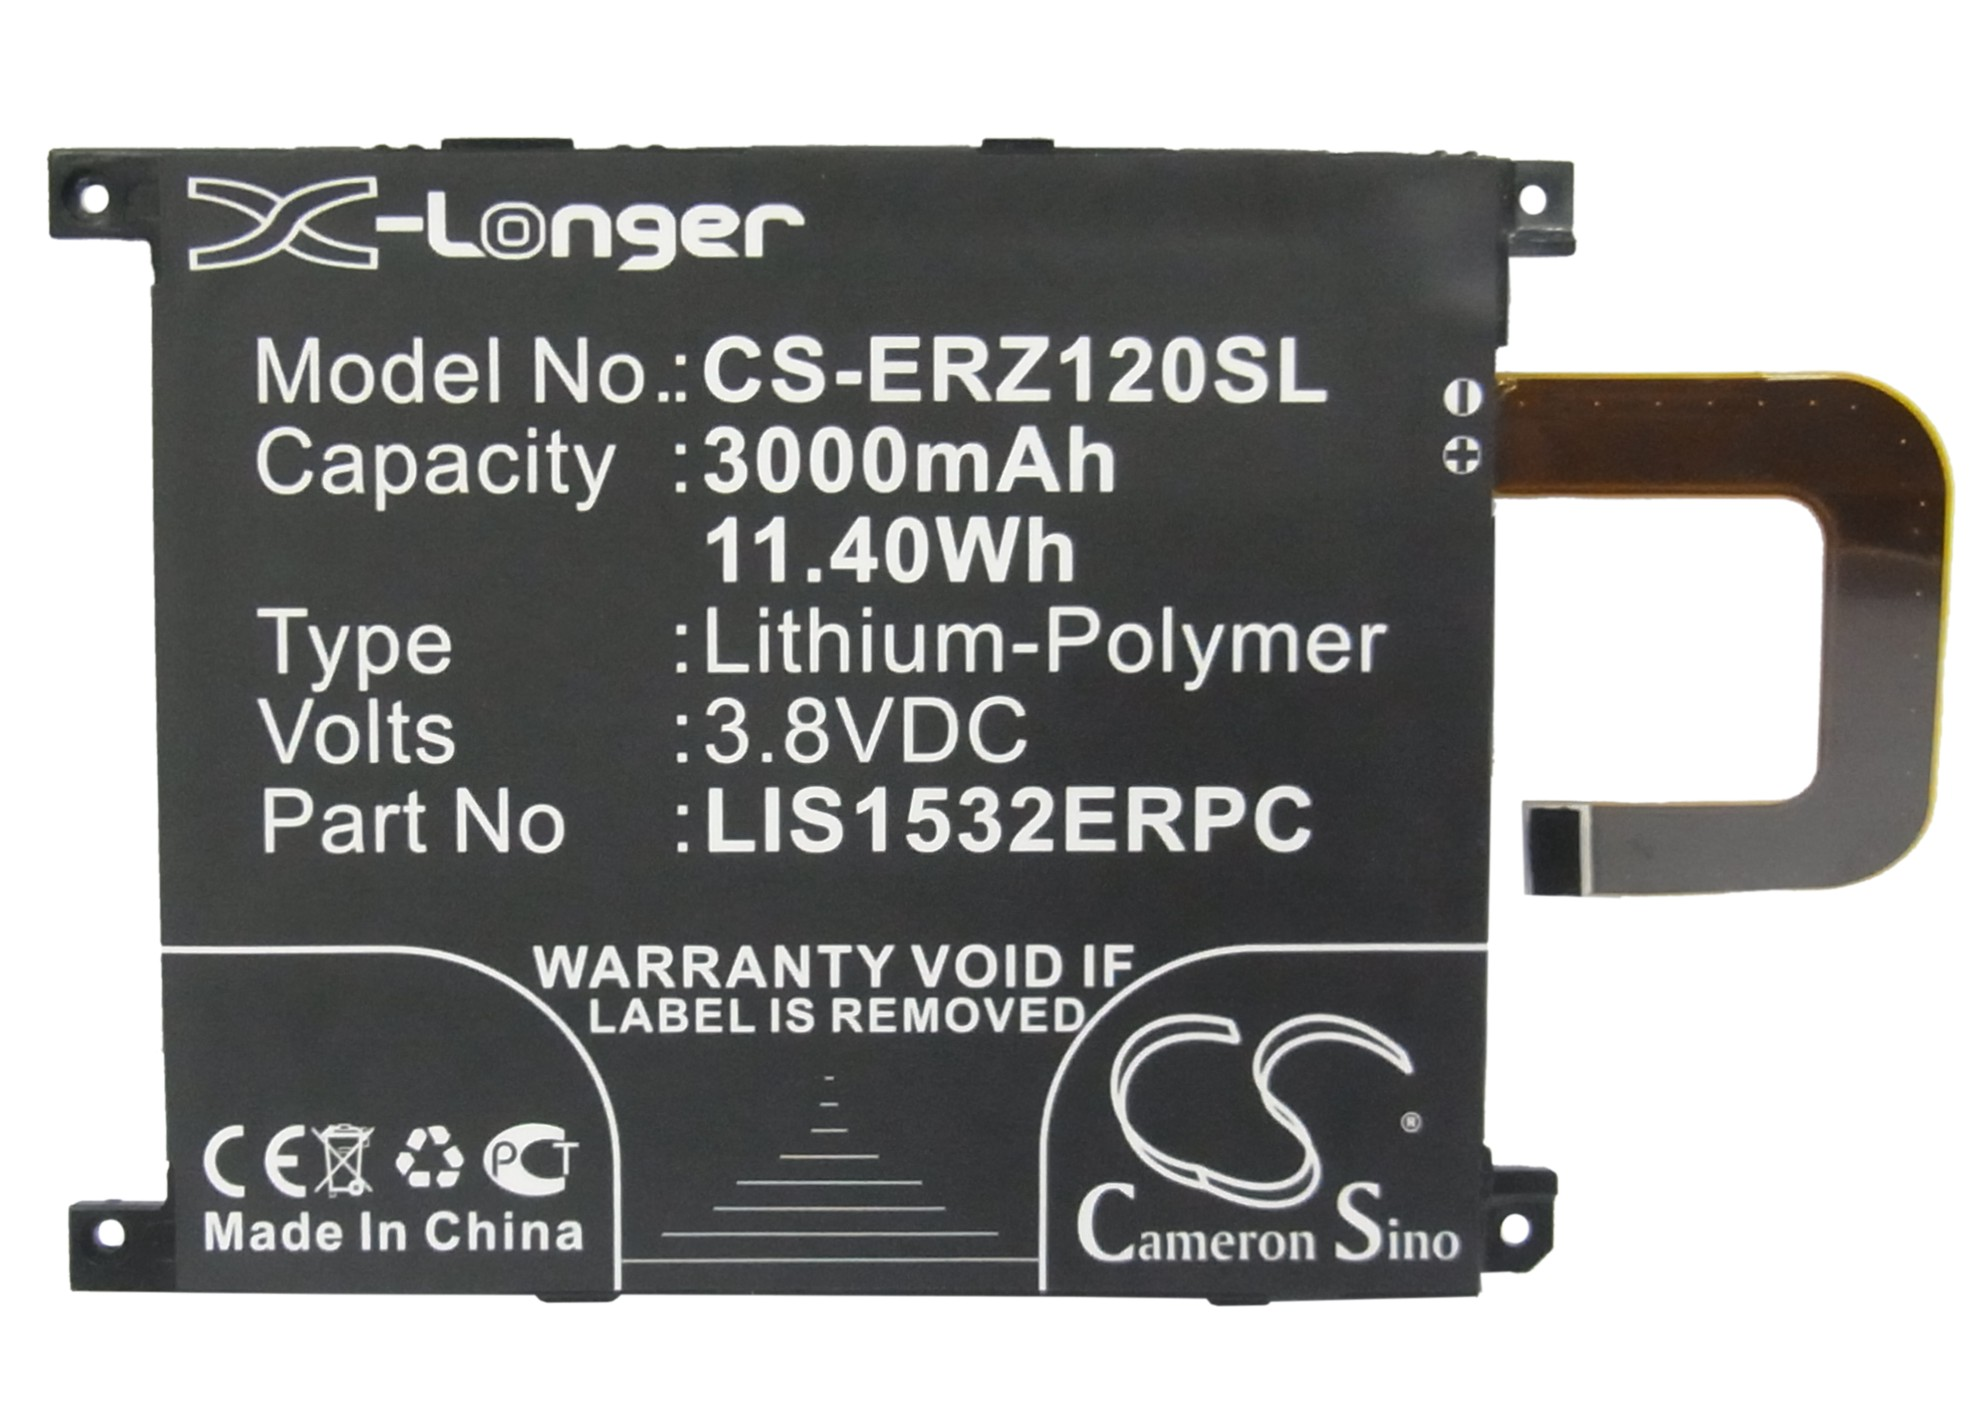 Cameron Sino 3000mAh Battery LIS1532ERPC for Sony Ericsson C6916, L39T, L39U, Xperia Z1 4G, Xperia Z1S